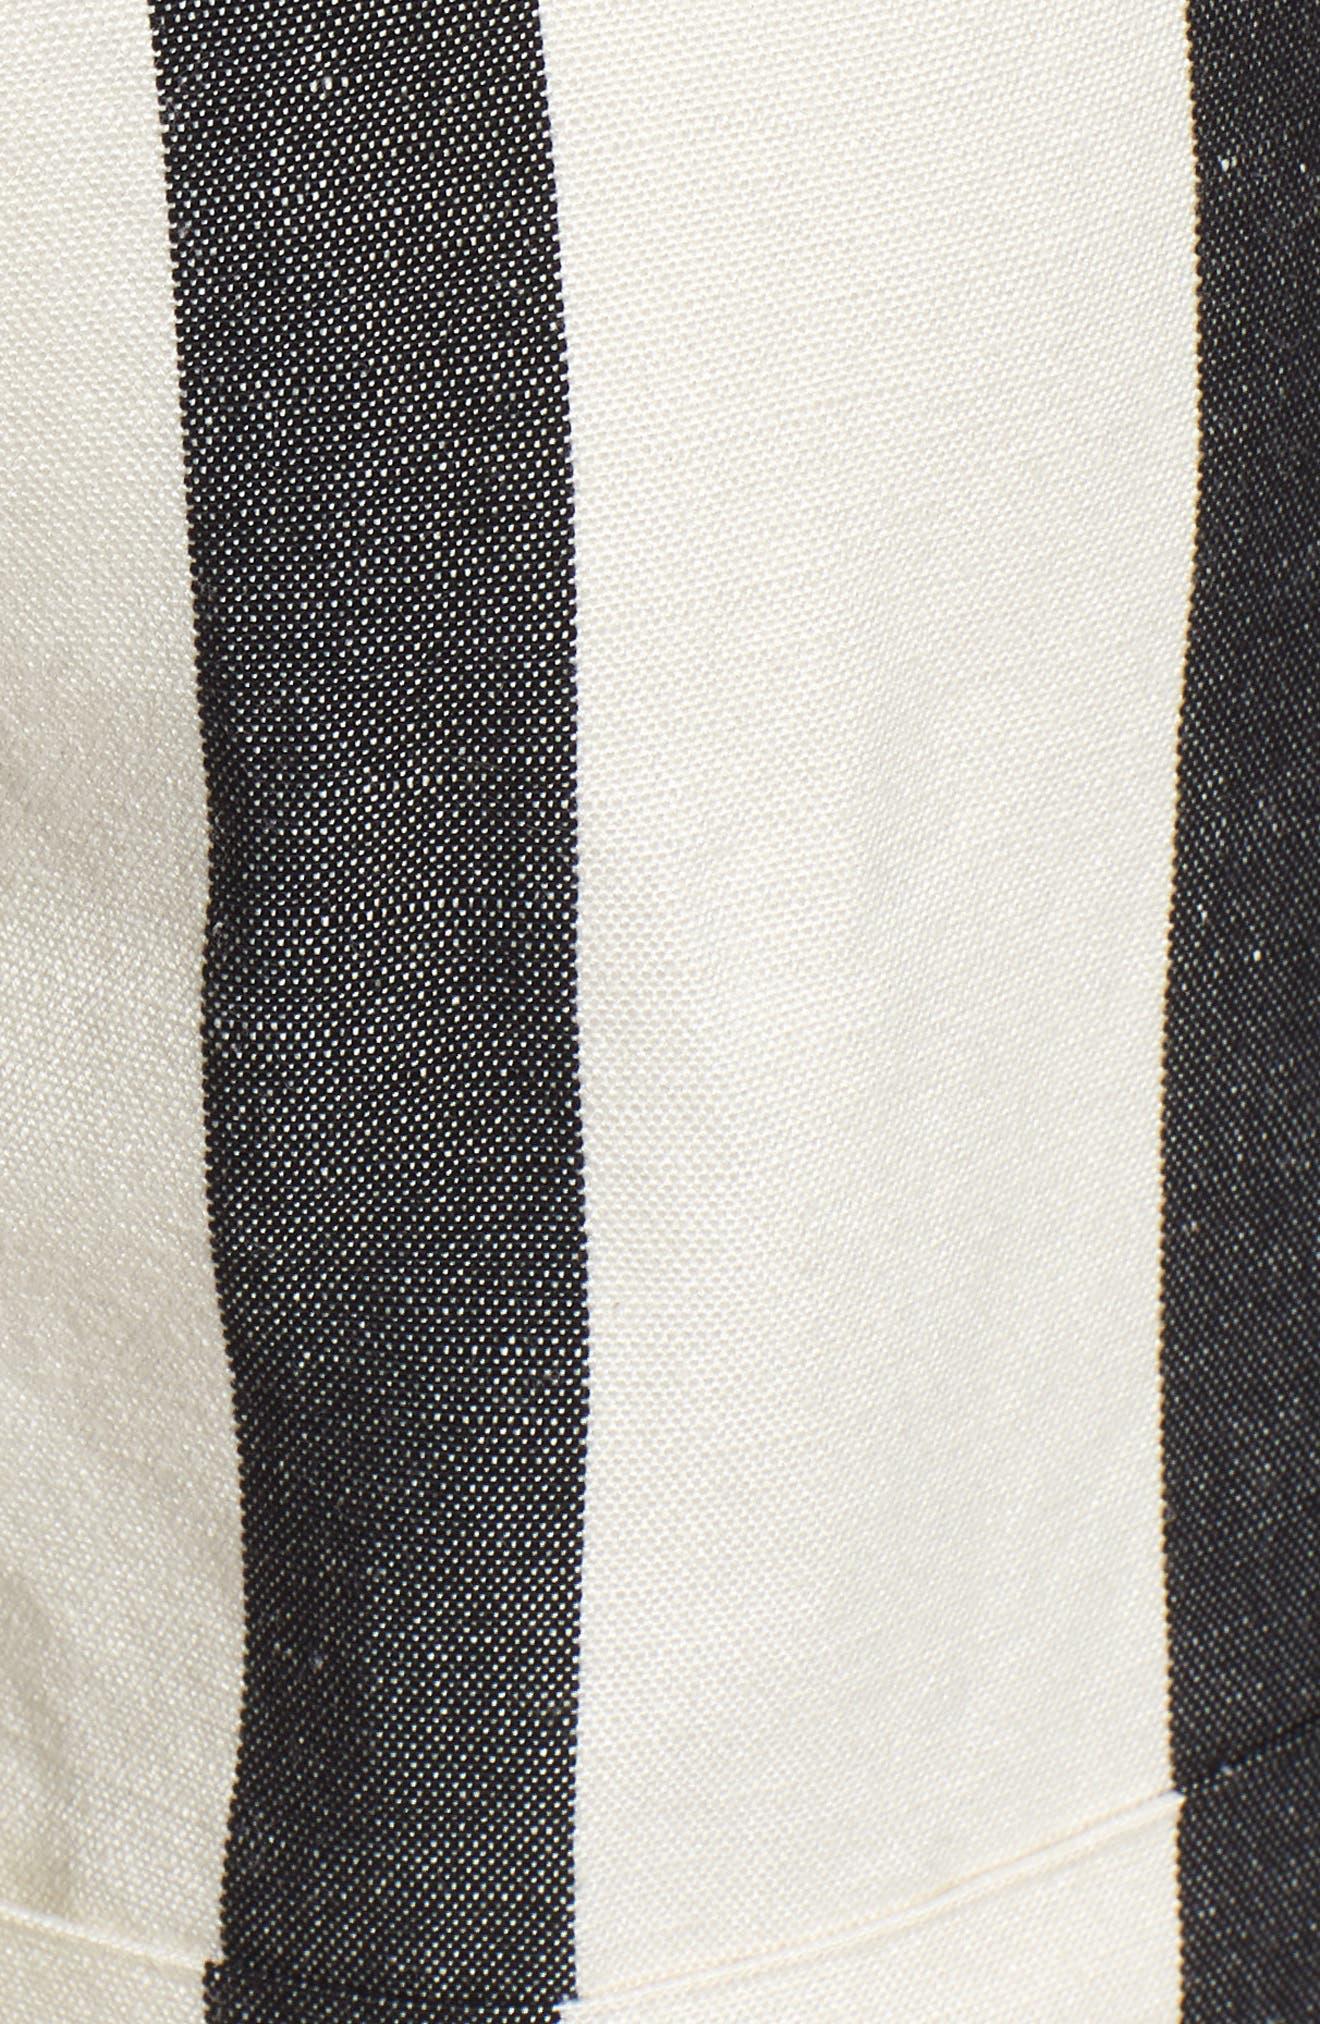 Stripe Cuff Shorts,                             Alternate thumbnail 5, color,                             Black- Ivory Bold Stripe